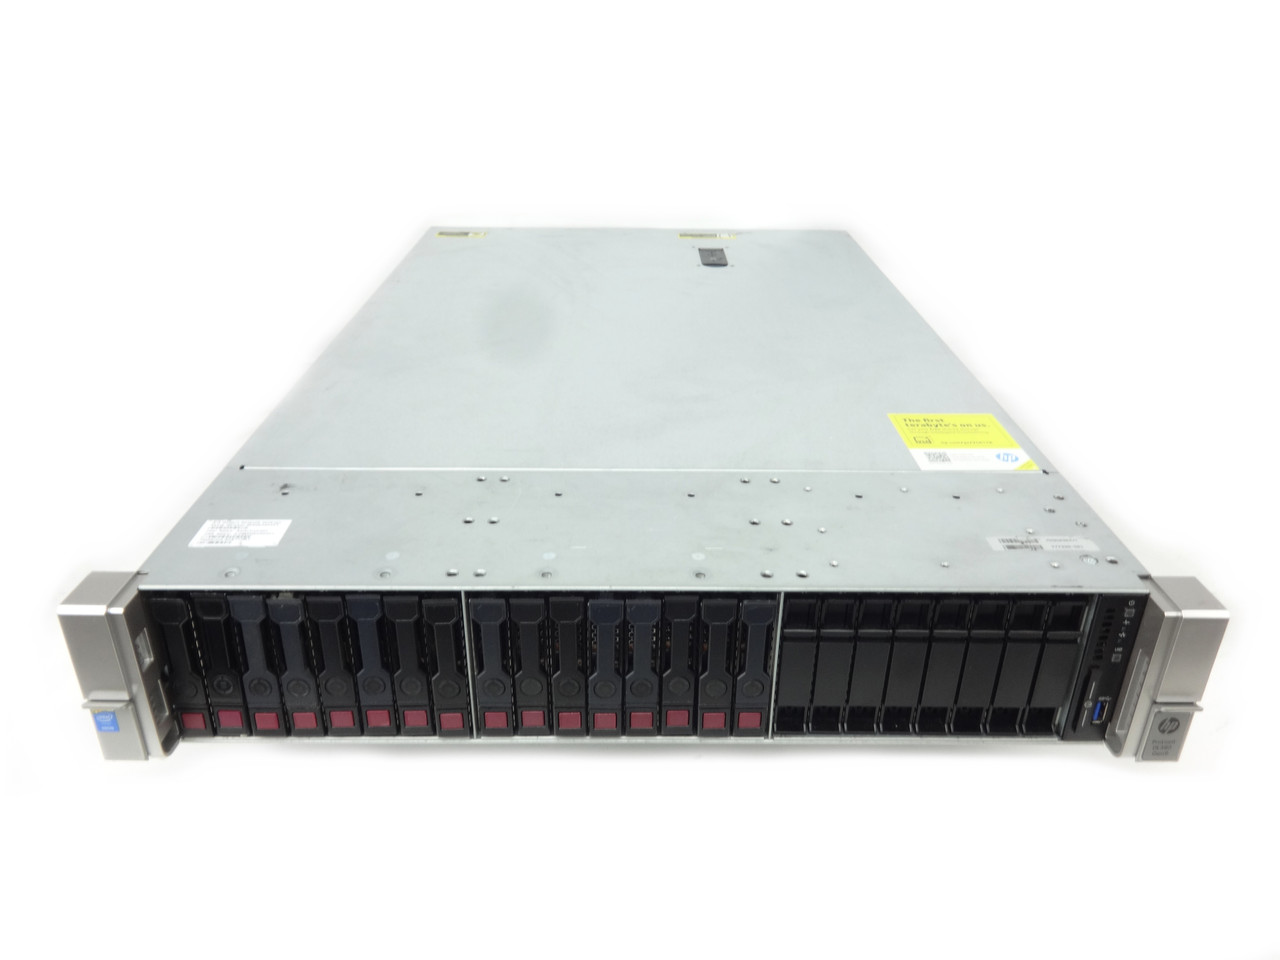 HP Proliant DL380 G9 Server